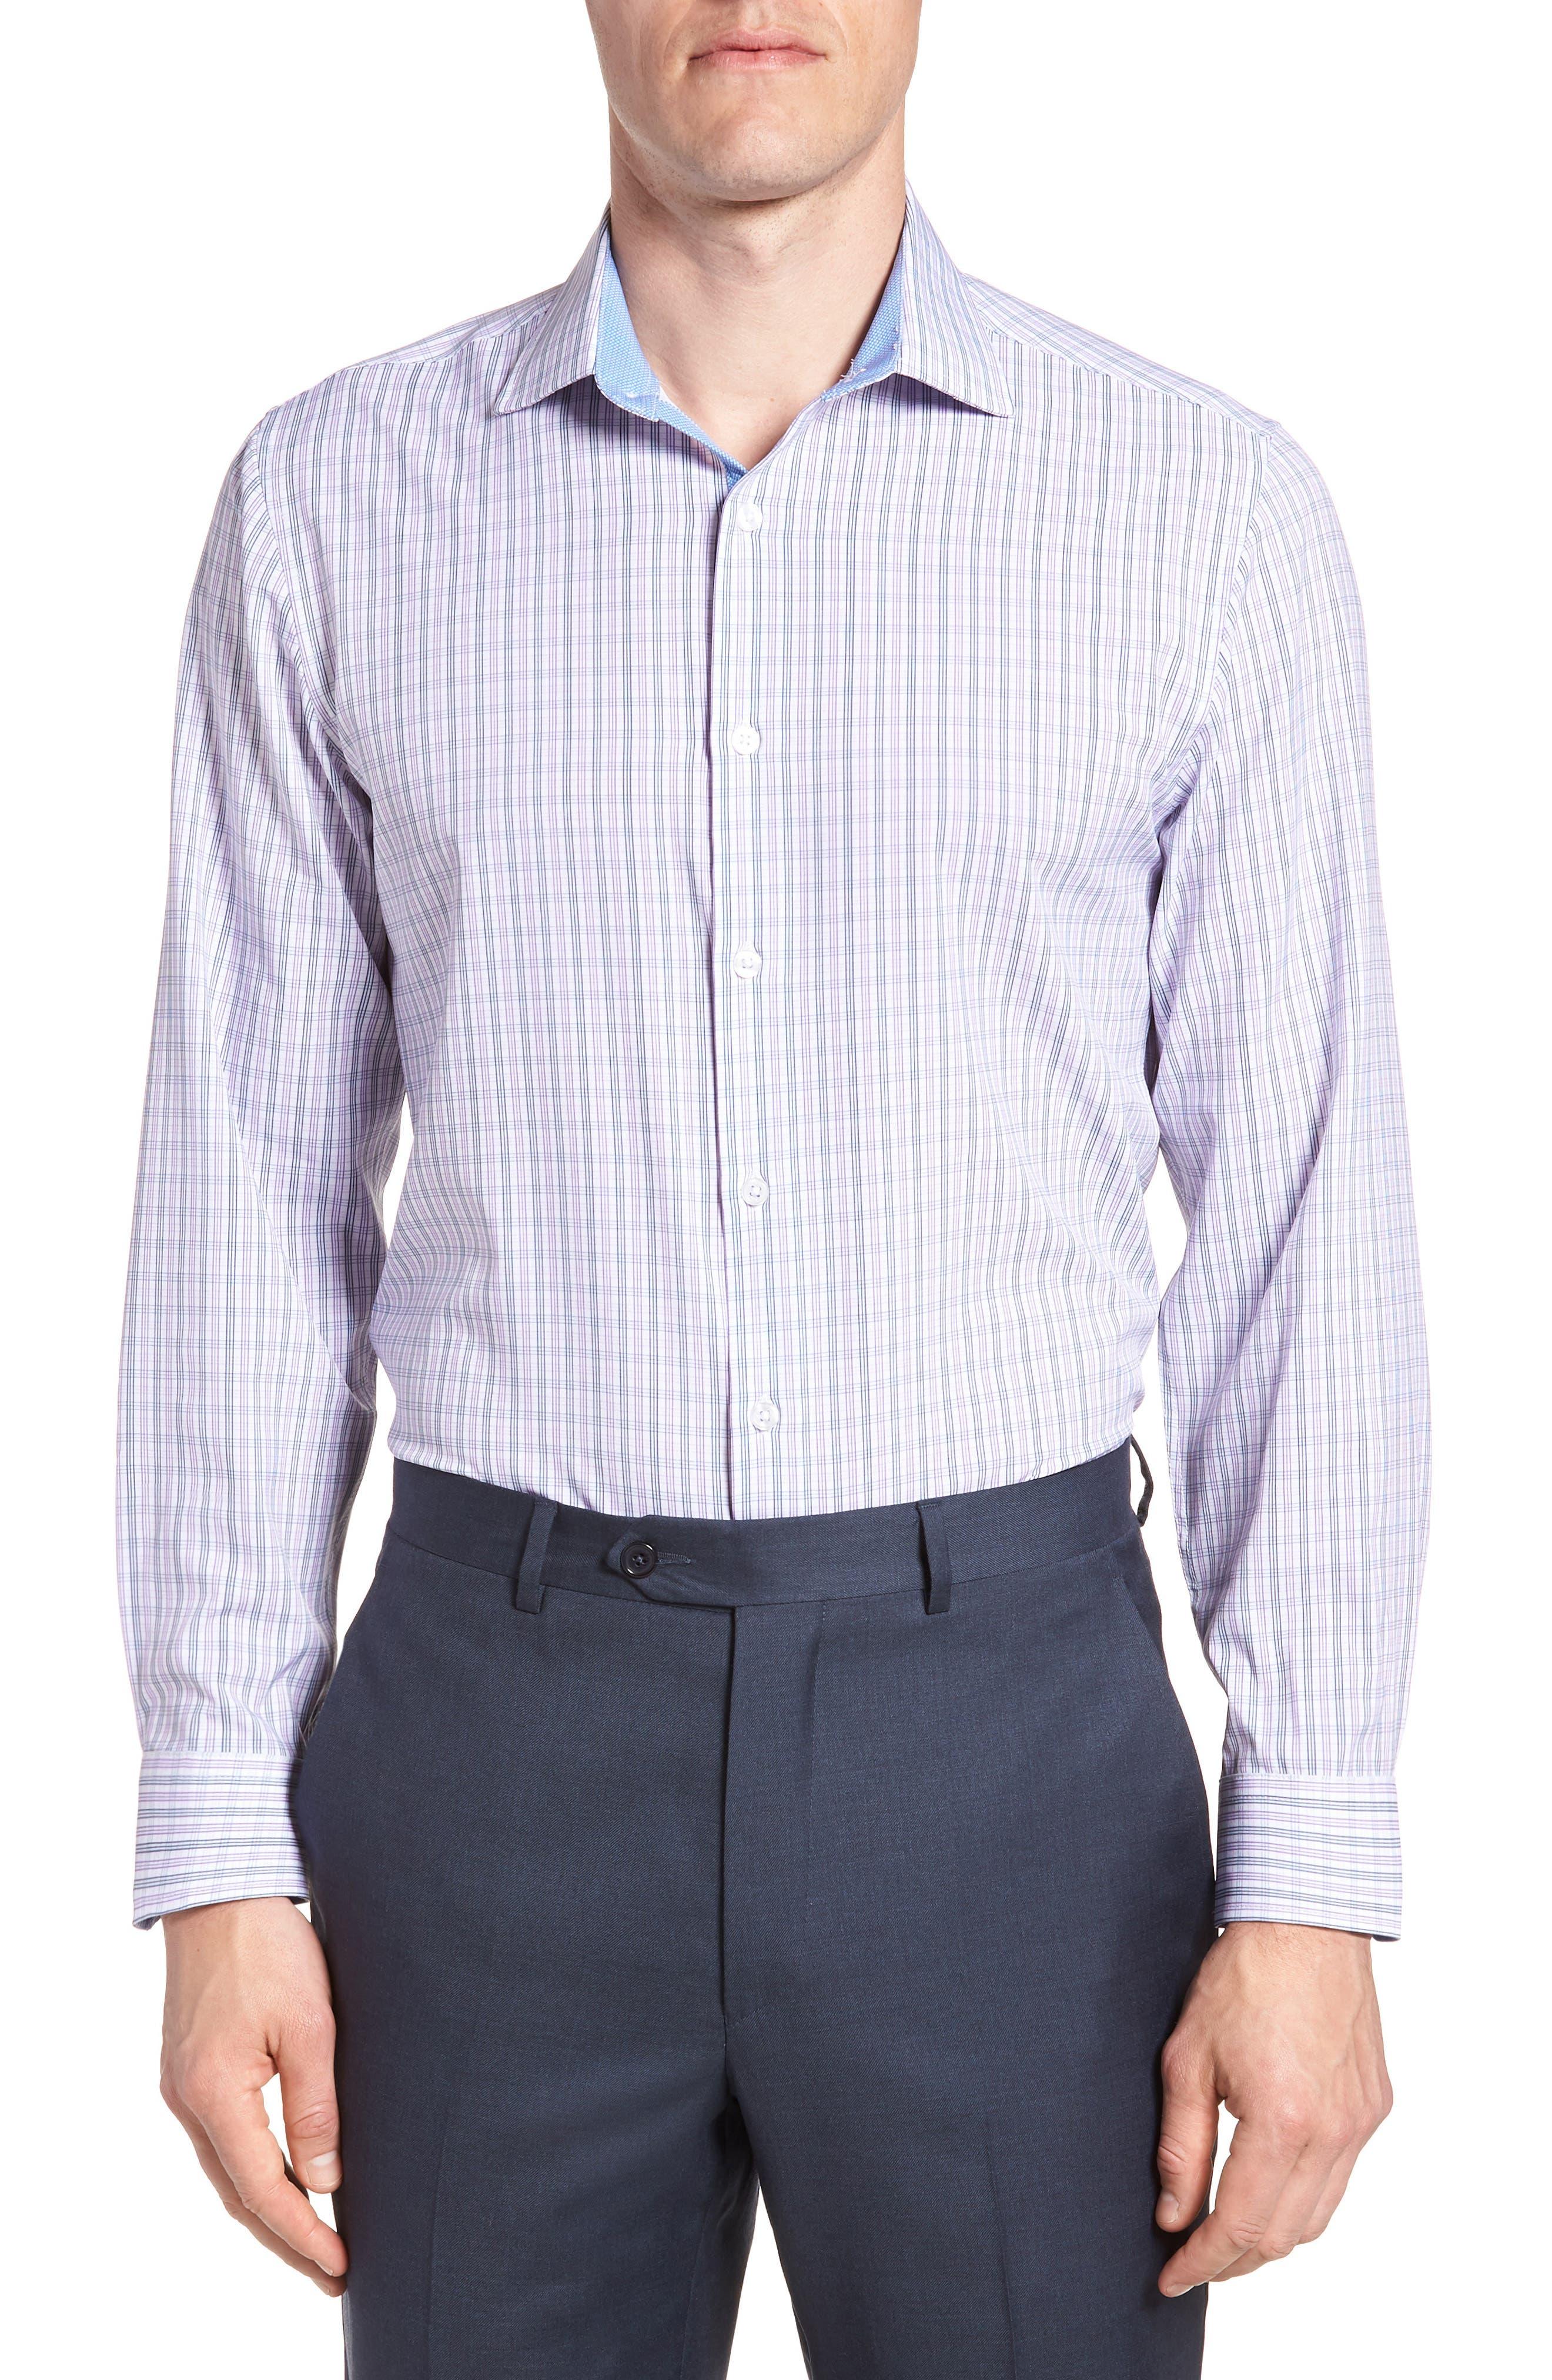 Trim Fit Check 4-Way Stretch Dress Shirt,                         Main,                         color, PURPLE